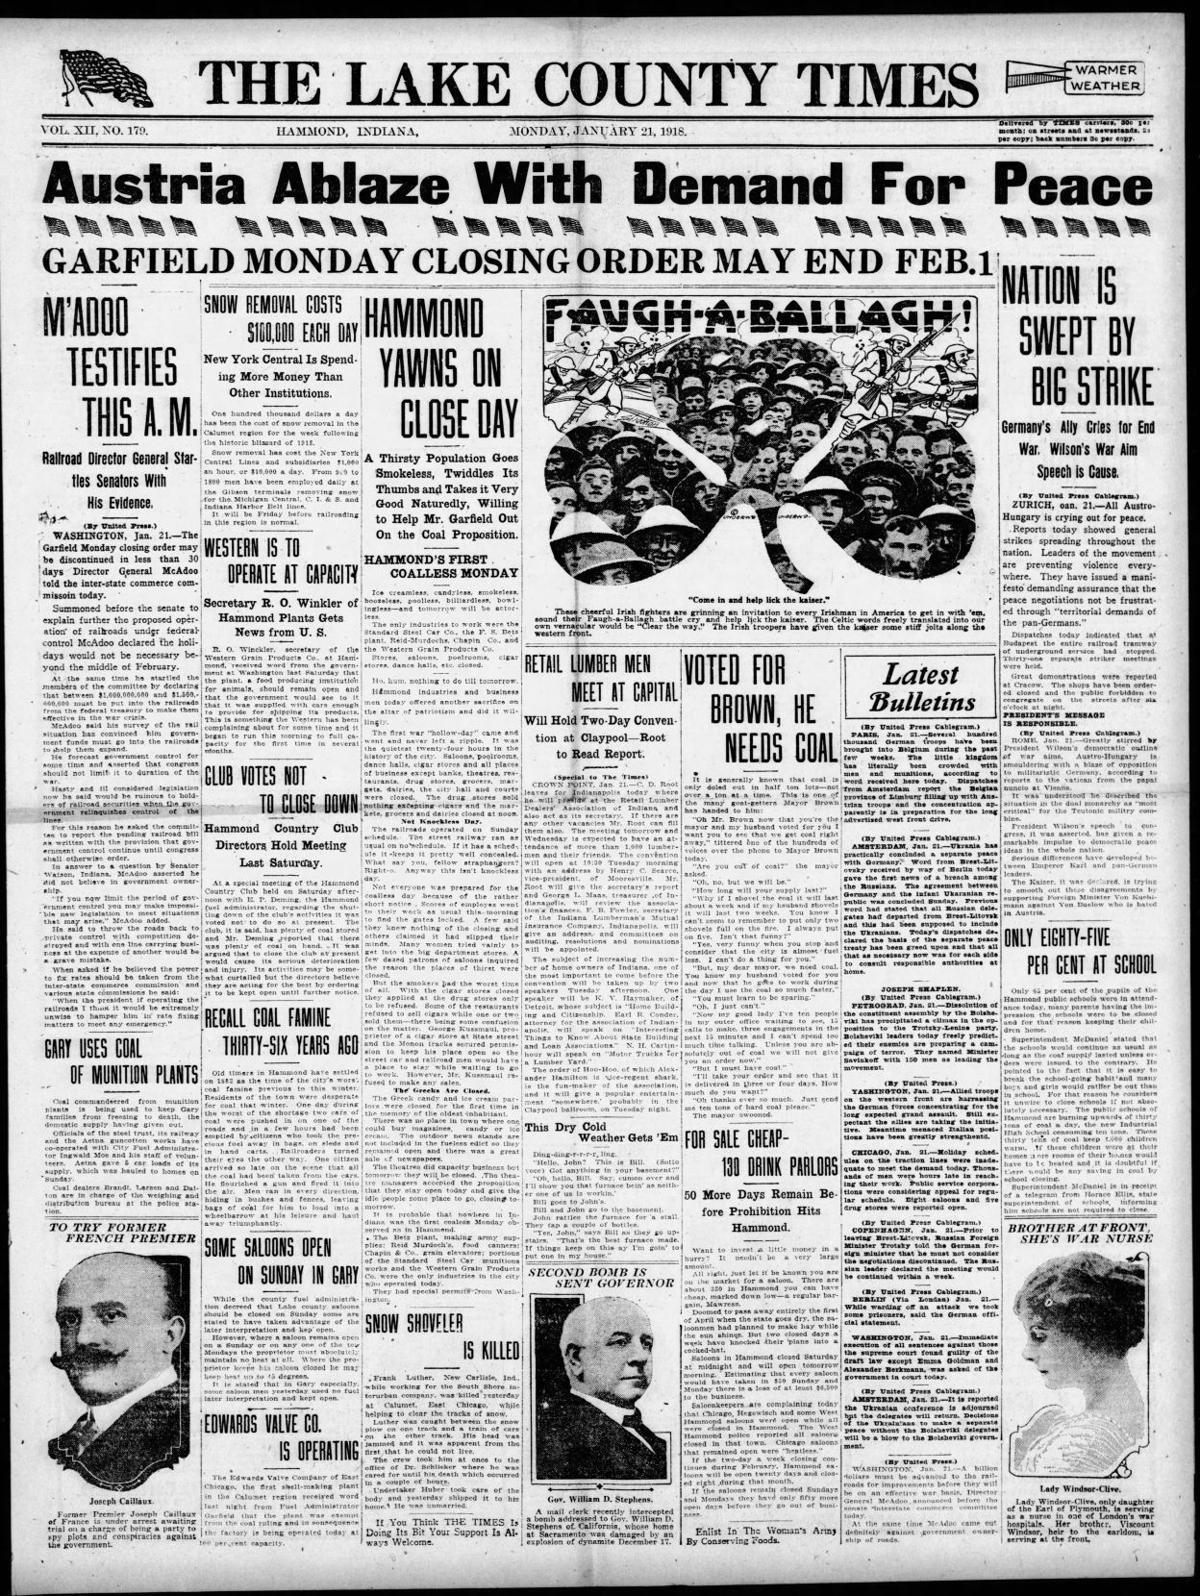 Jan. 21, 1918: Austria Ablaze With Demand For Peace